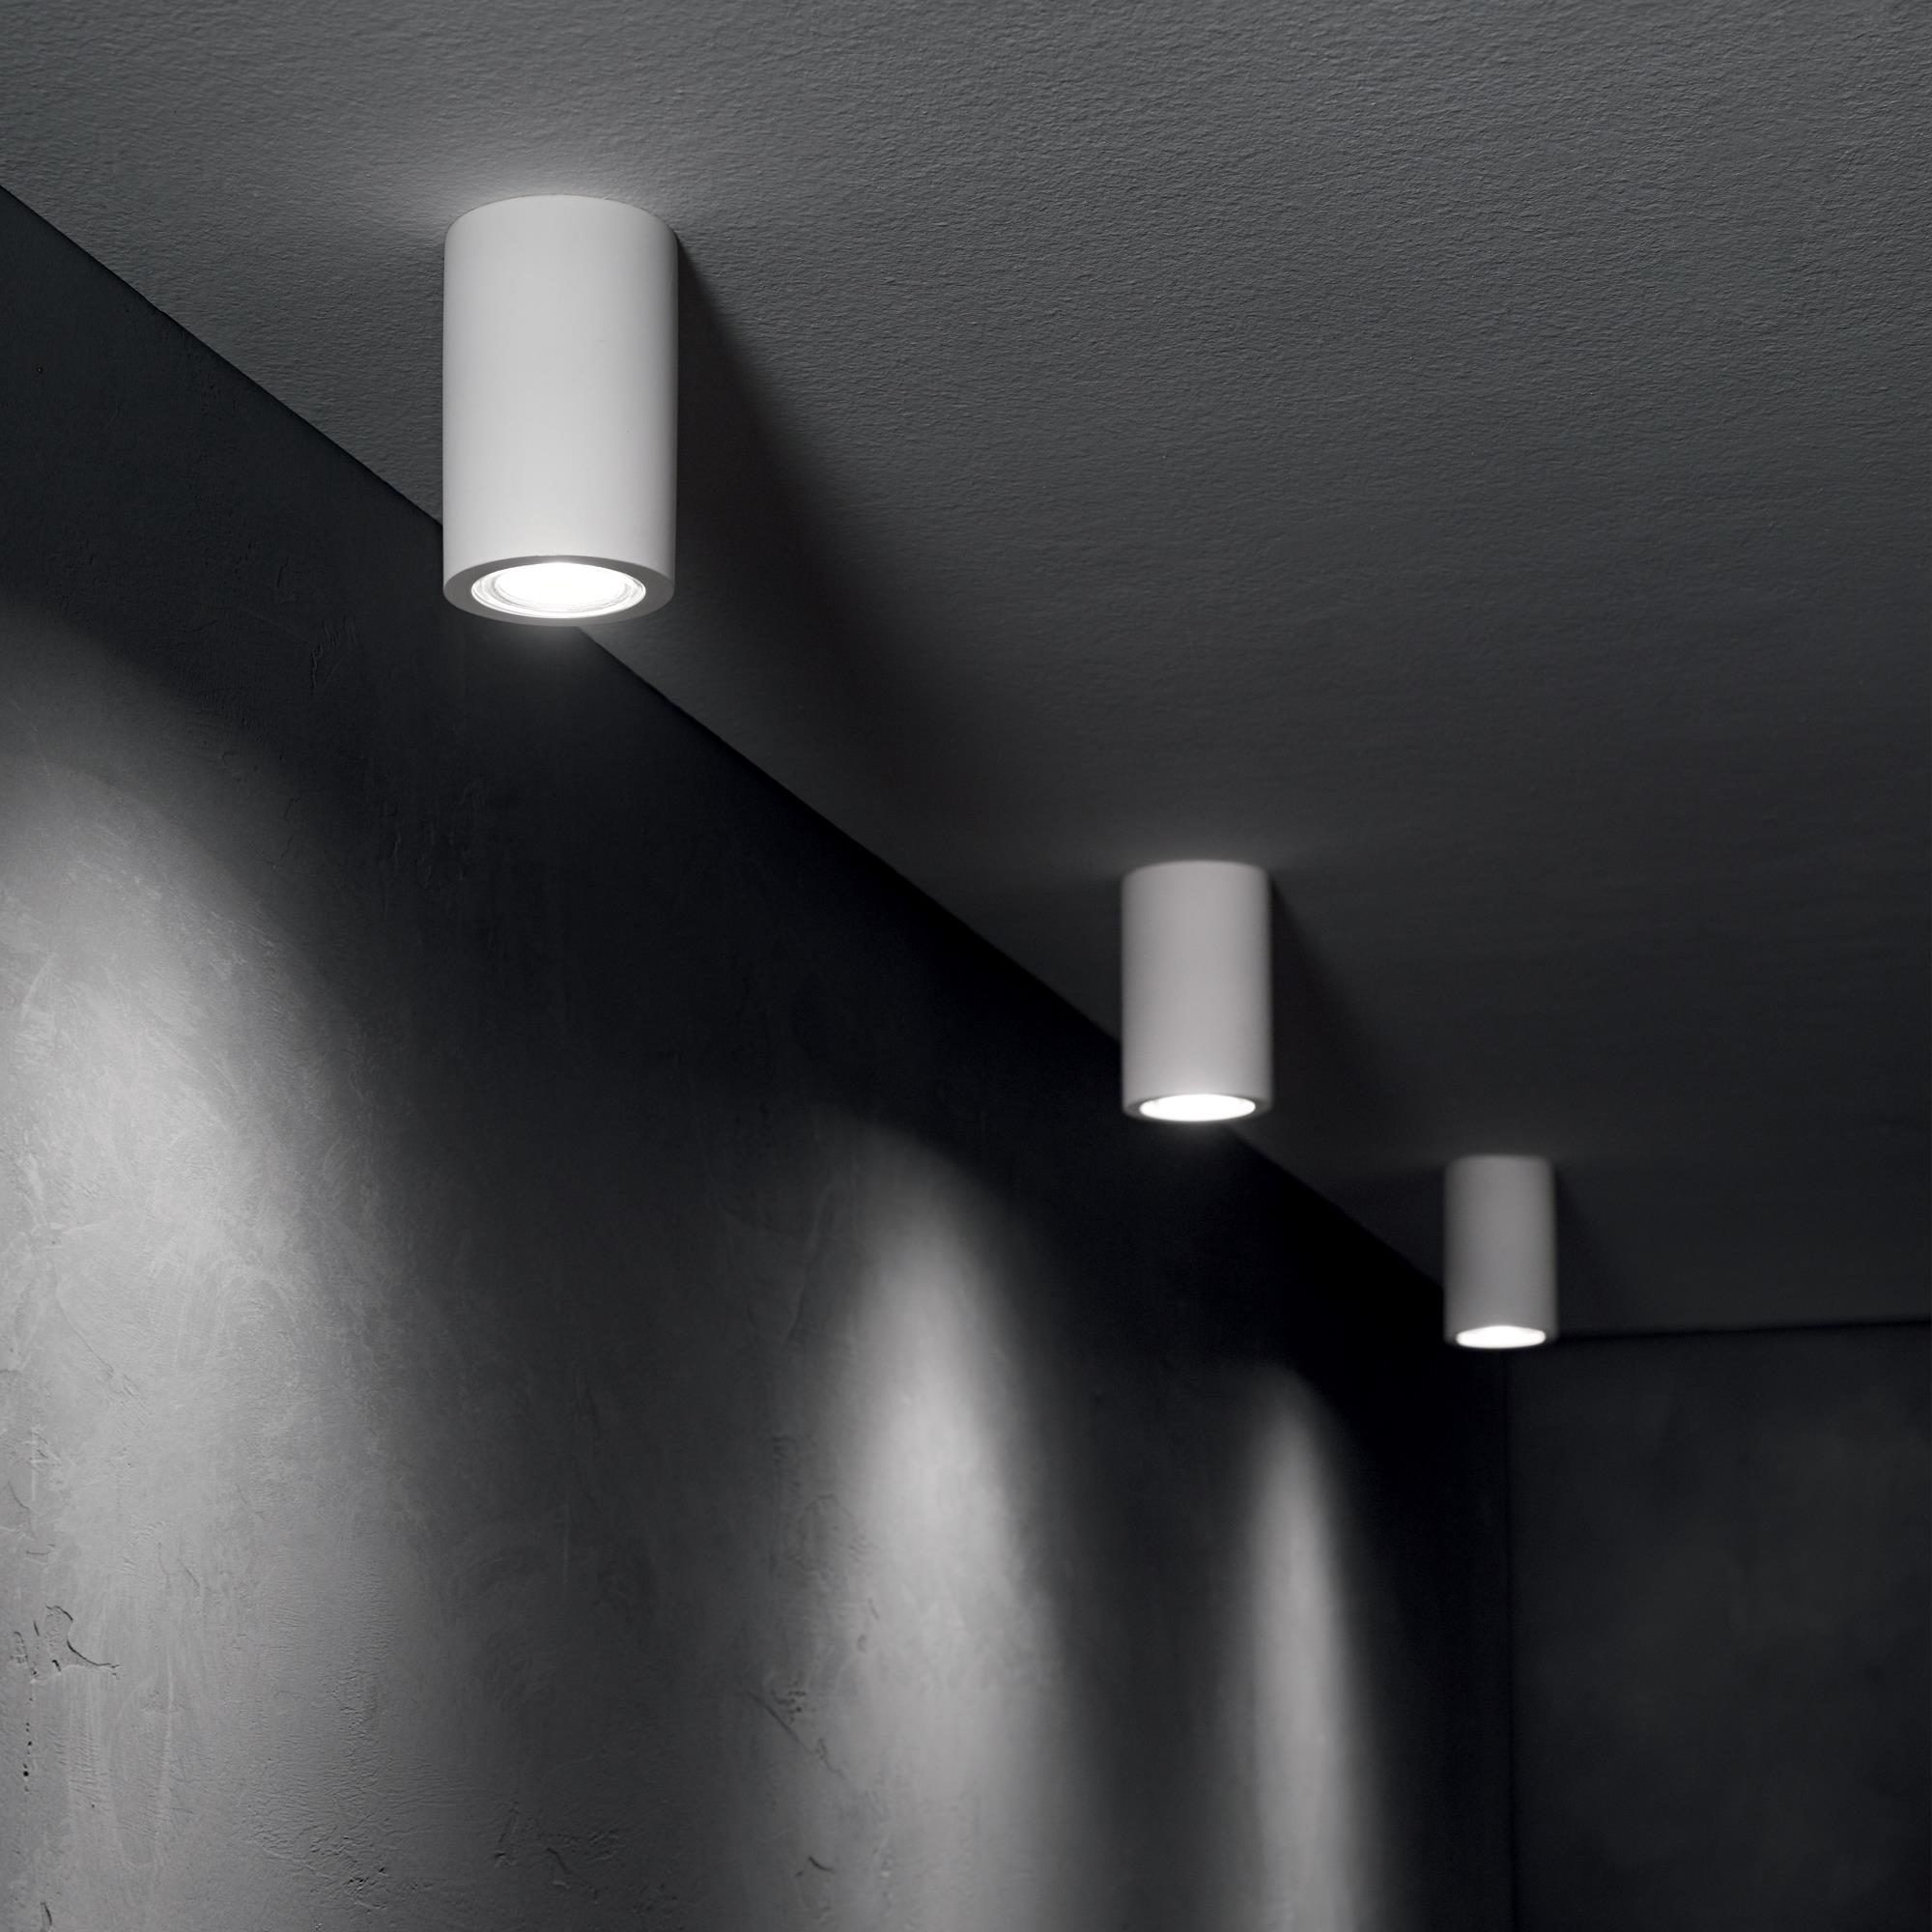 Ideal Lux 155869 TOWER PL1 ROUND gipsz mennyezeti lámpa